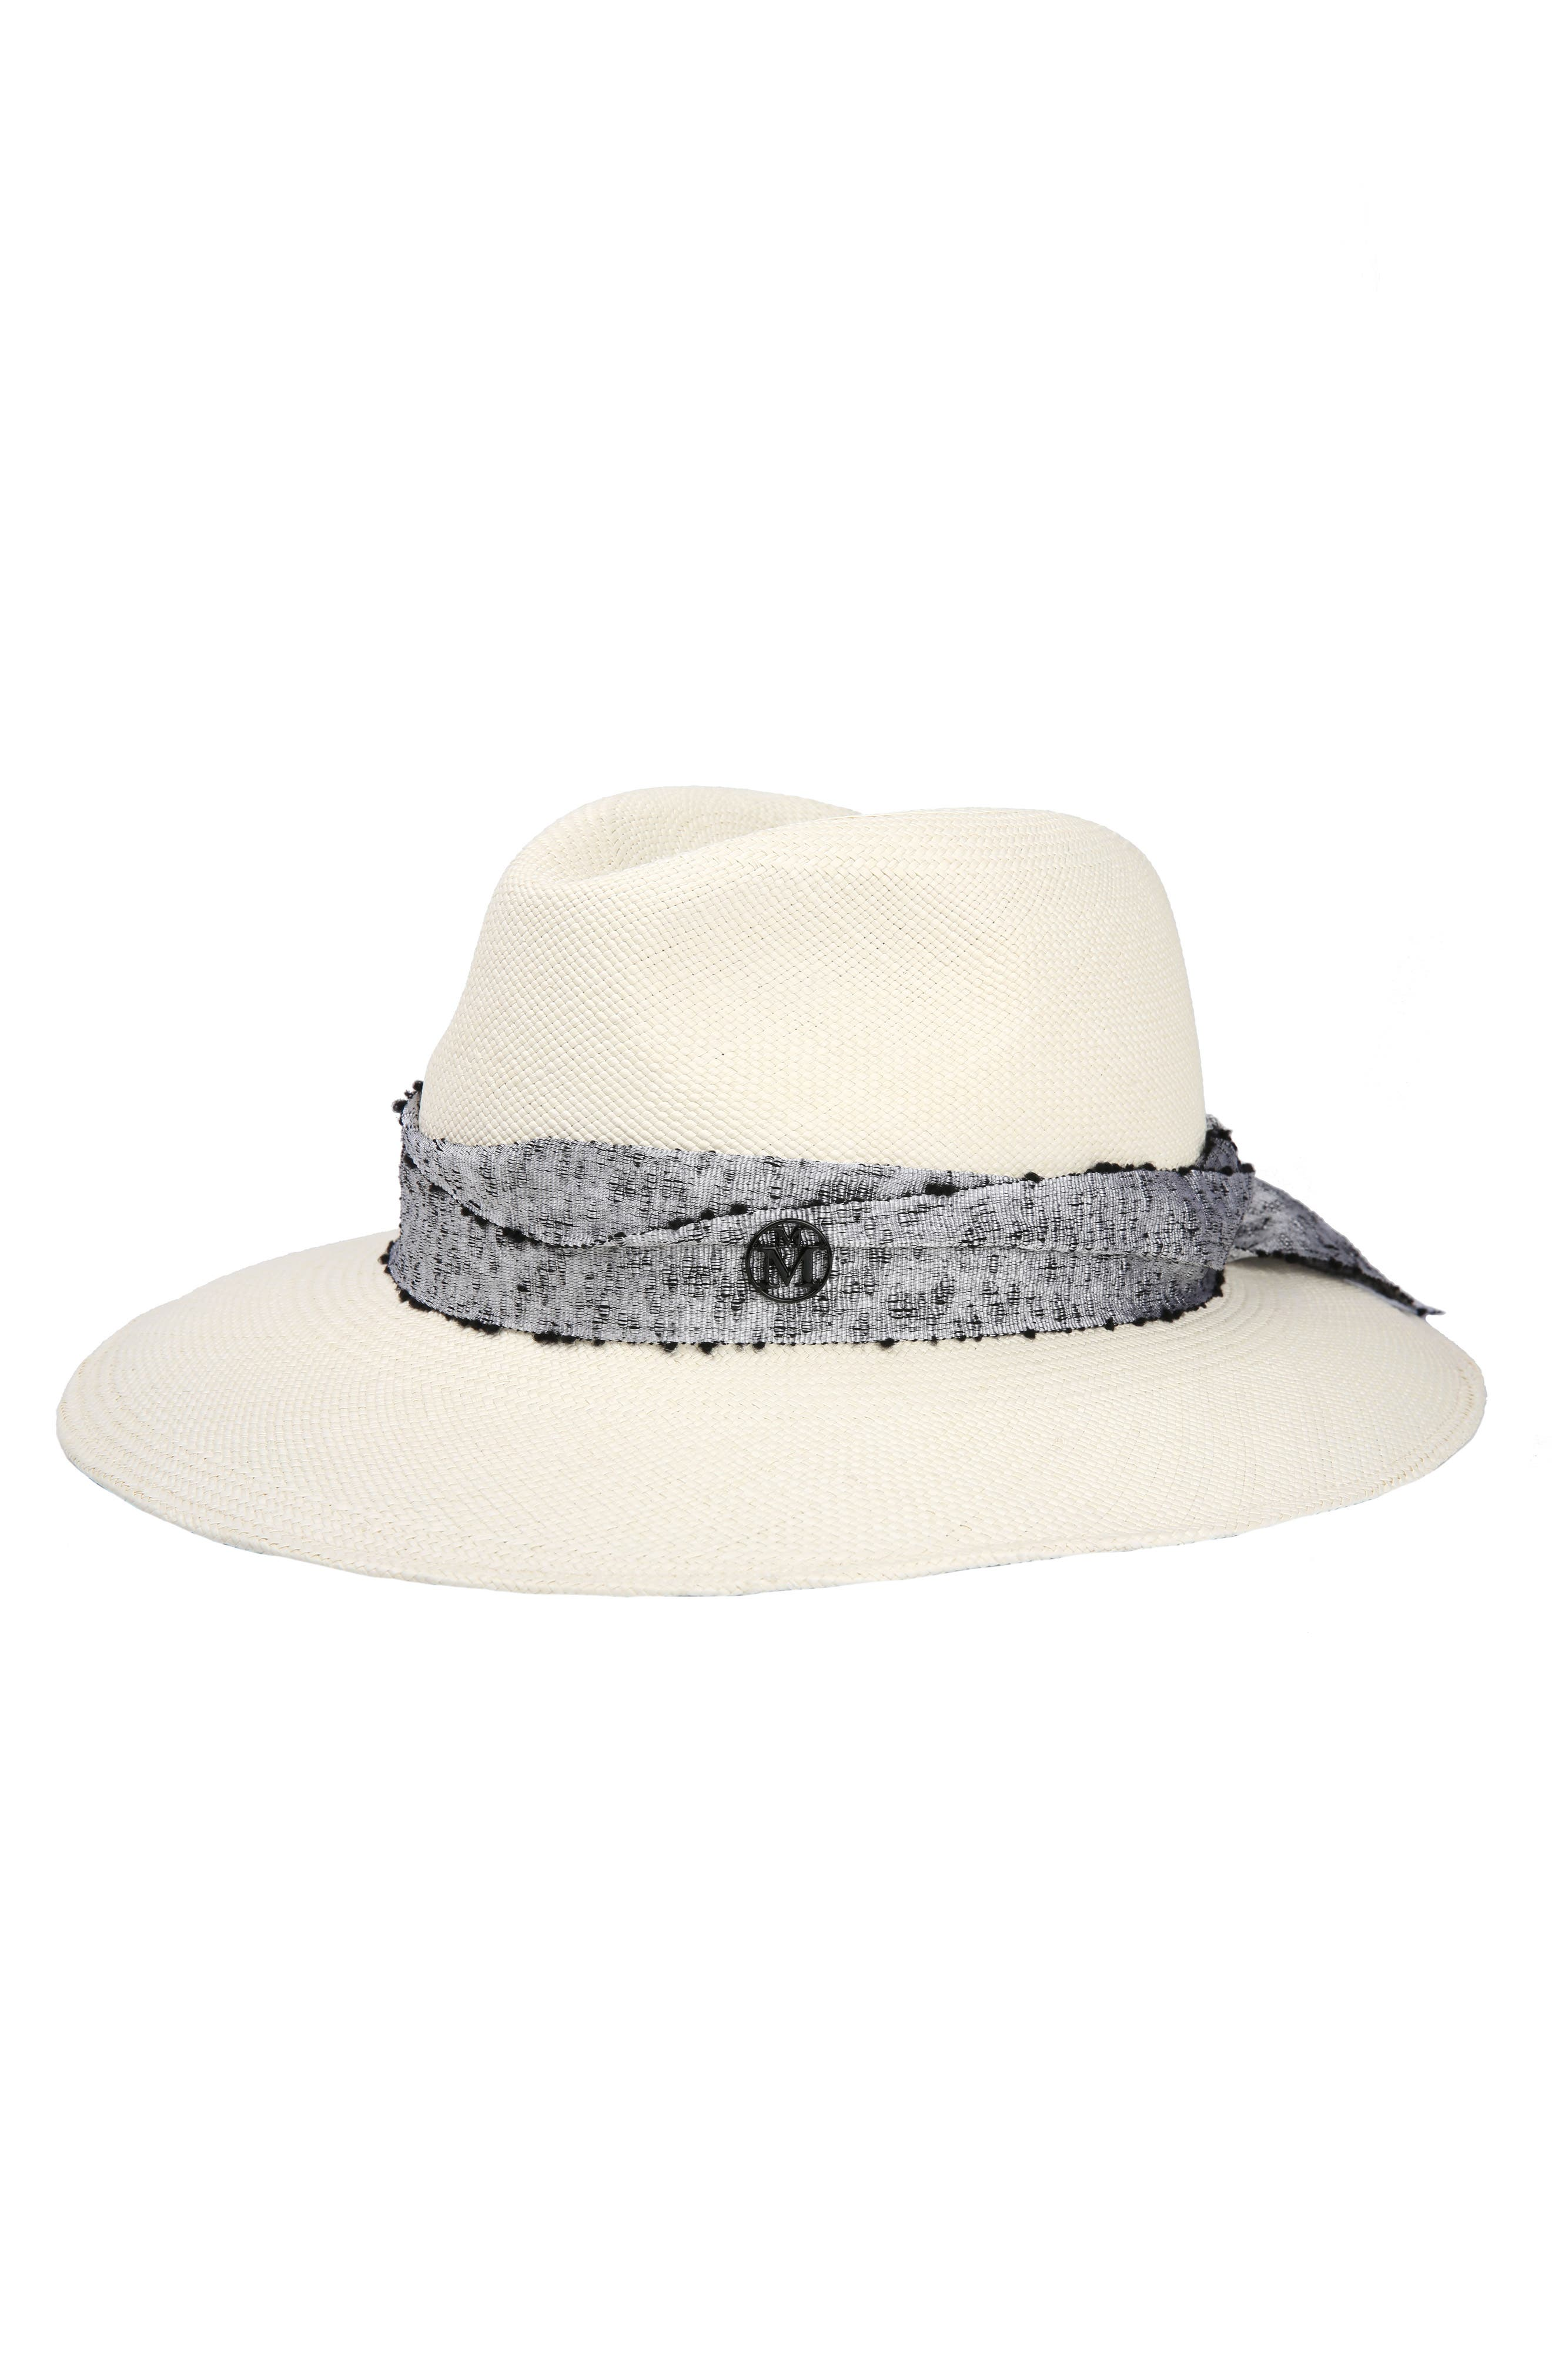 Henrietta Mottled Ribbon Hemp Hat,                             Main thumbnail 1, color,